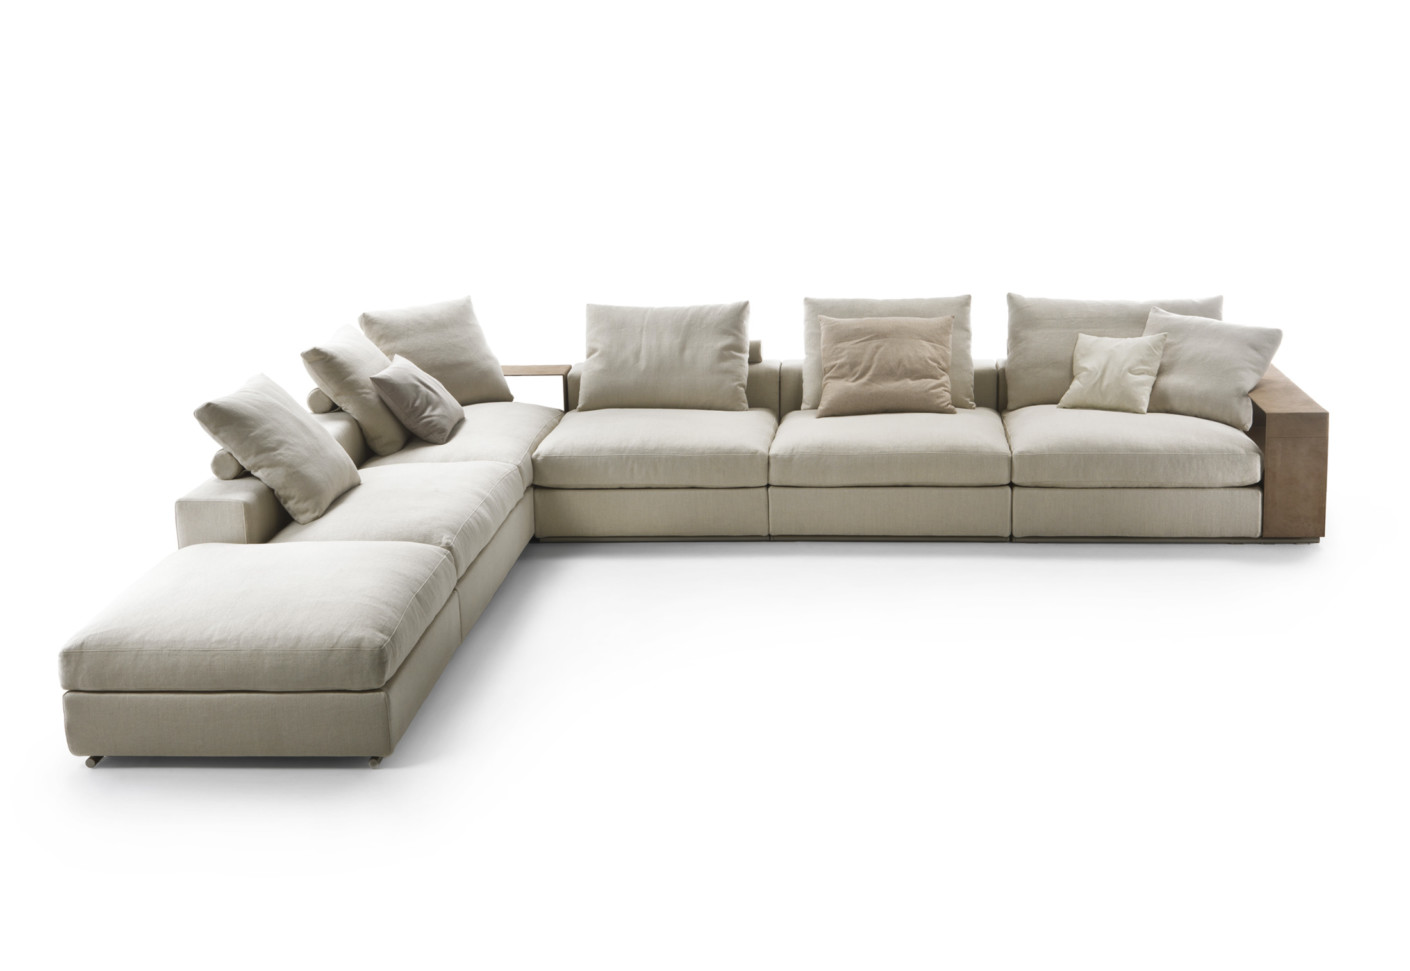 Flexform Groundpiece Sofa Flexform Groundpiece Sofa